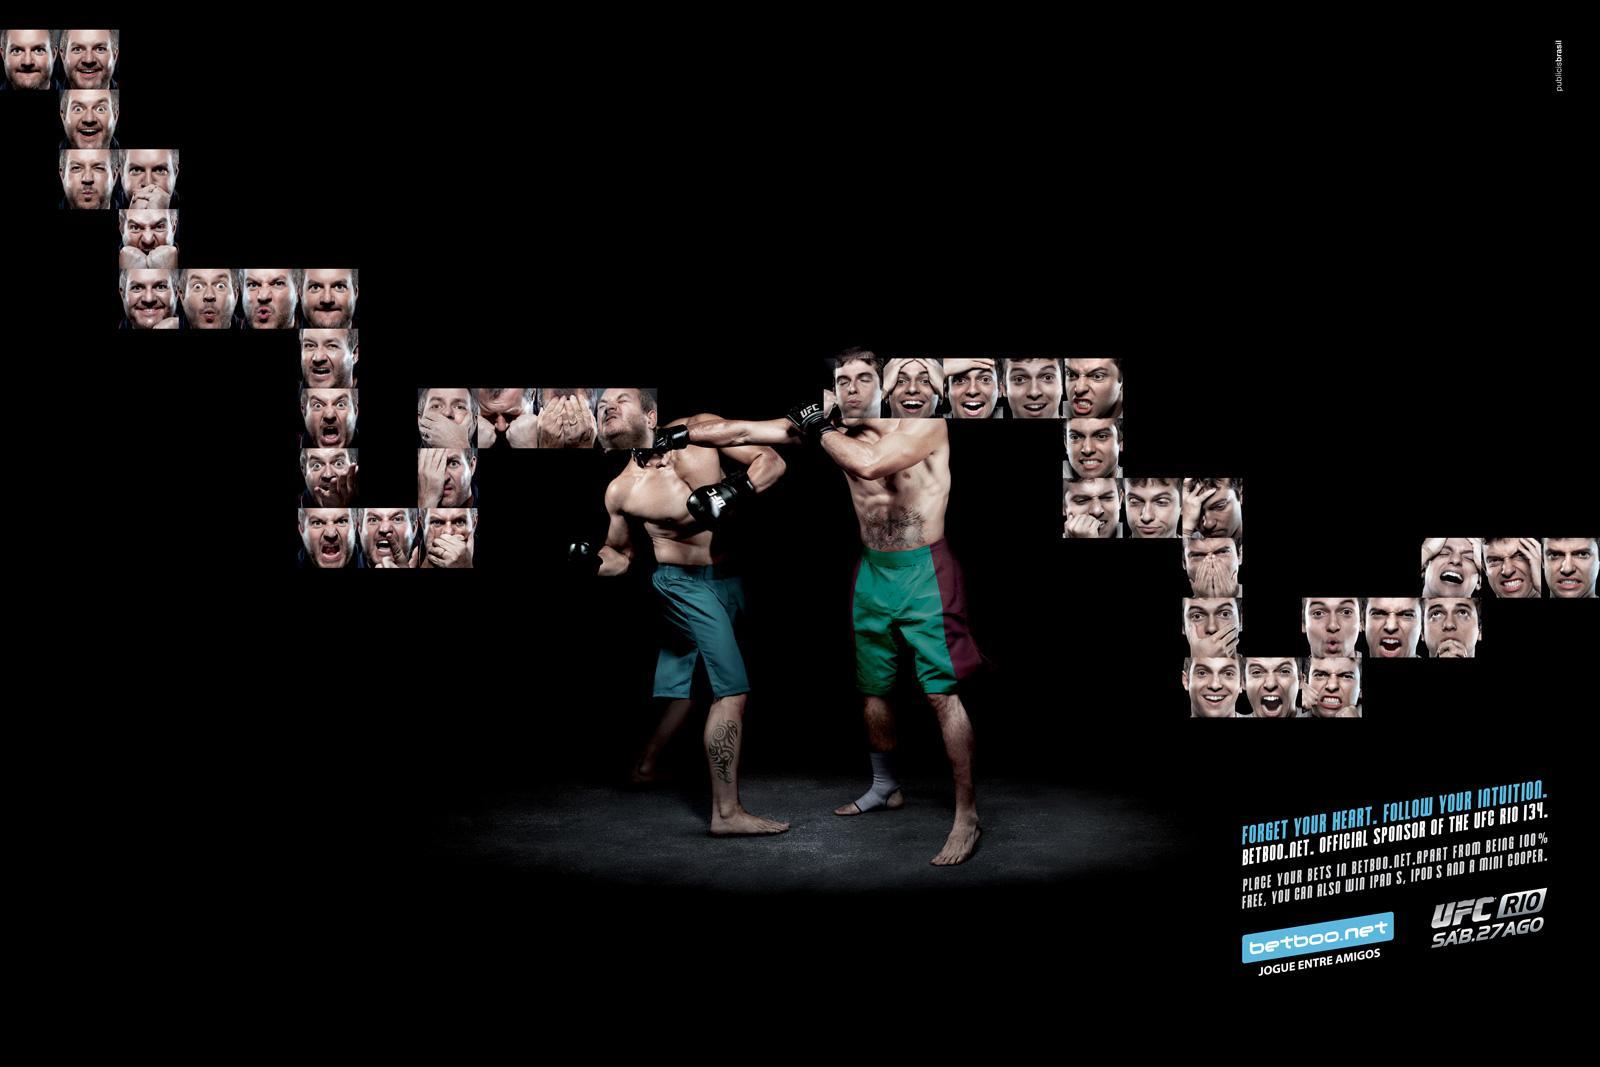 Betboo.net Print Ad -  UFC RIO 134 Boxing